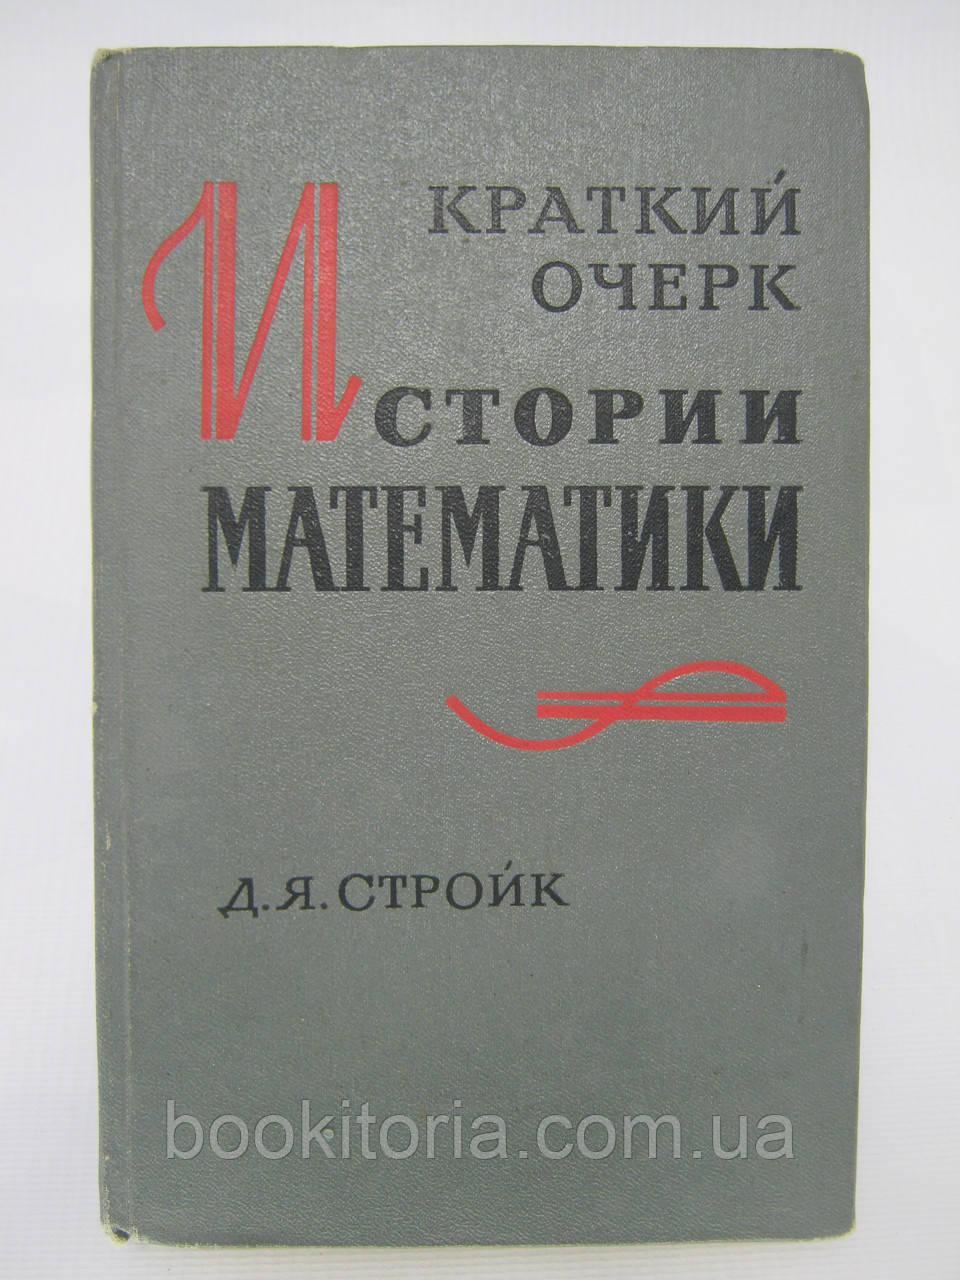 Стройк Д.Я. Краткий очерк истории математики (б/у).